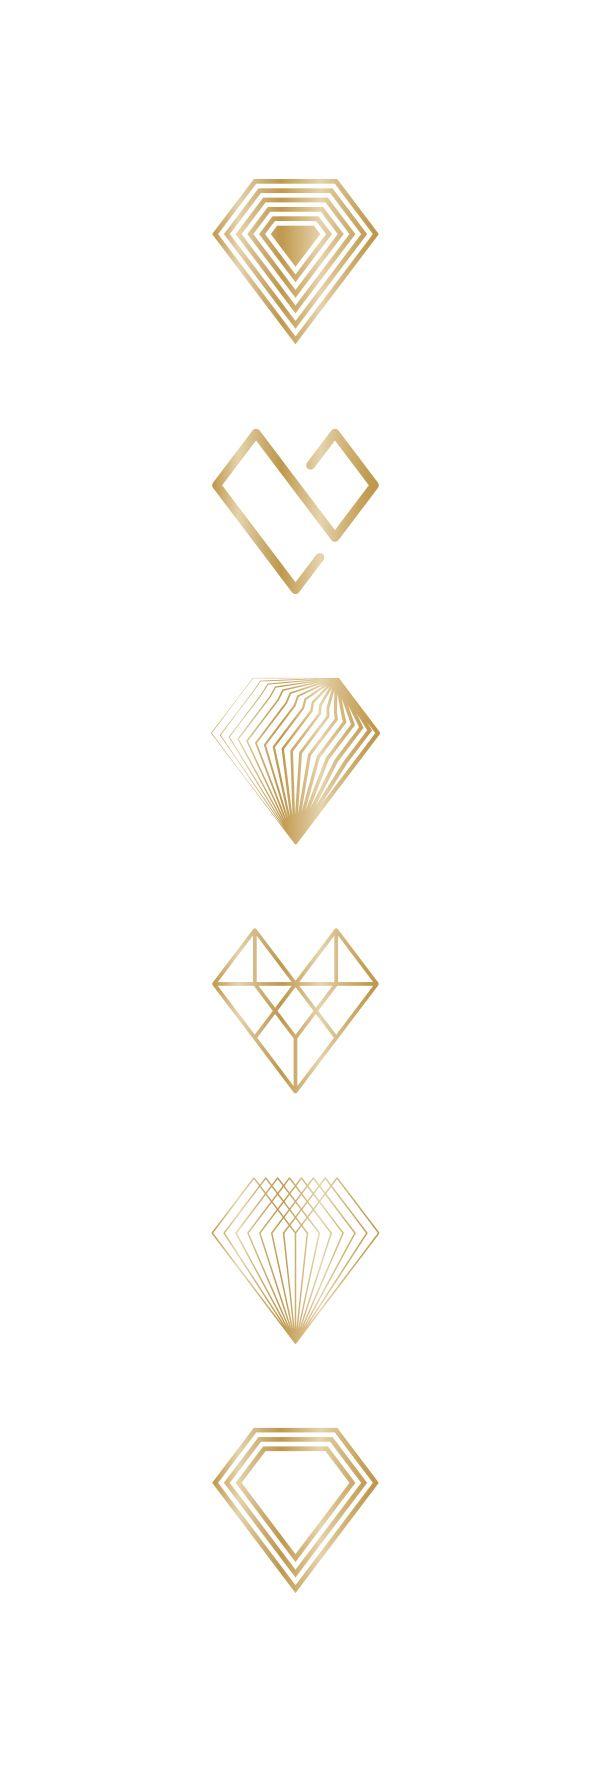 best 25 diamond logo ideas on pinterest jewelry logo diamond between heart diamond on behance more